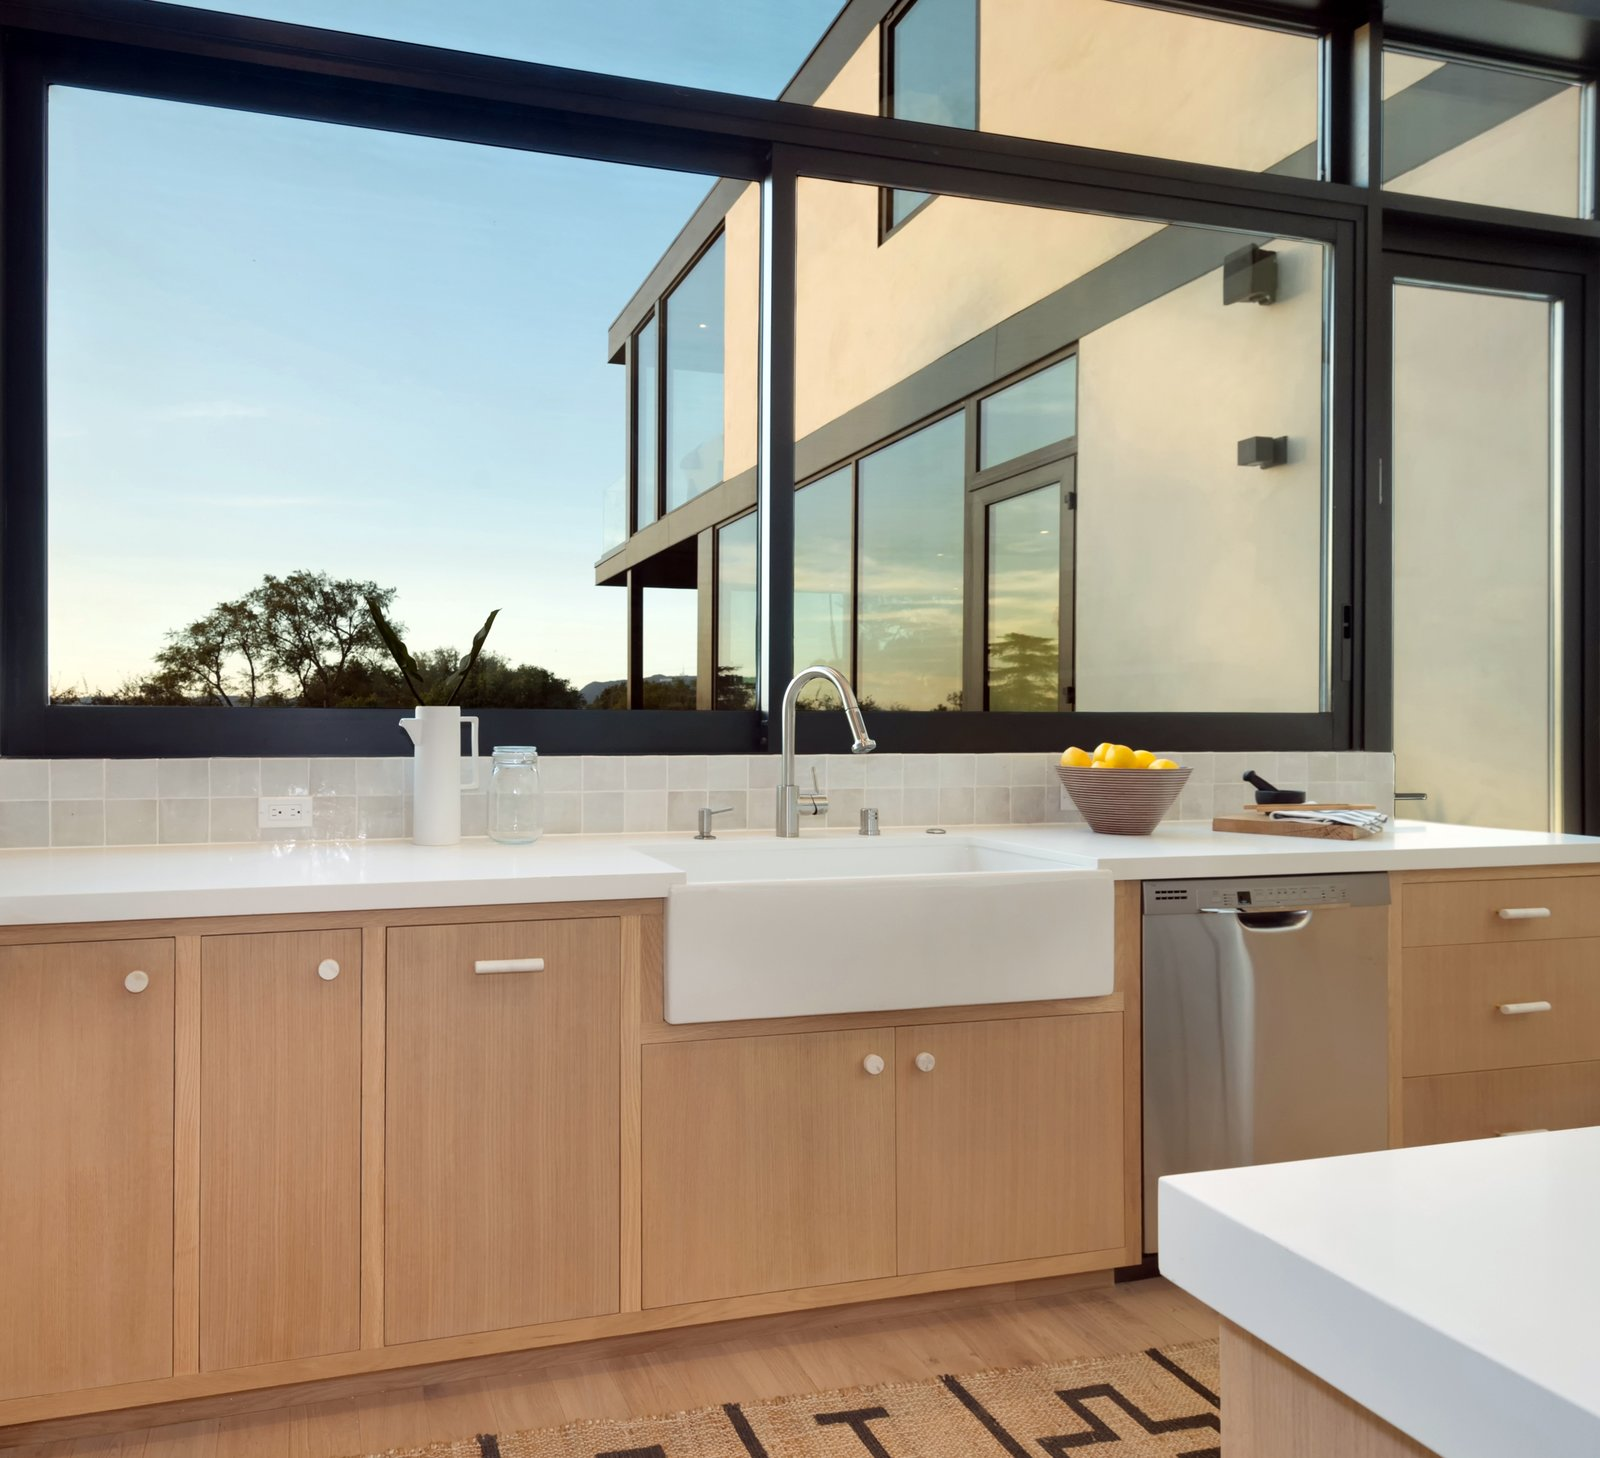 Kitchen, Ceramic Tile Backsplashe, Dishwasher, Engineered Quartz Counter, Medium Hardwood Floor, Vessel Sink, and Wood Cabinet Kitchen  SL House by ANX / Aaron Neubert Architects